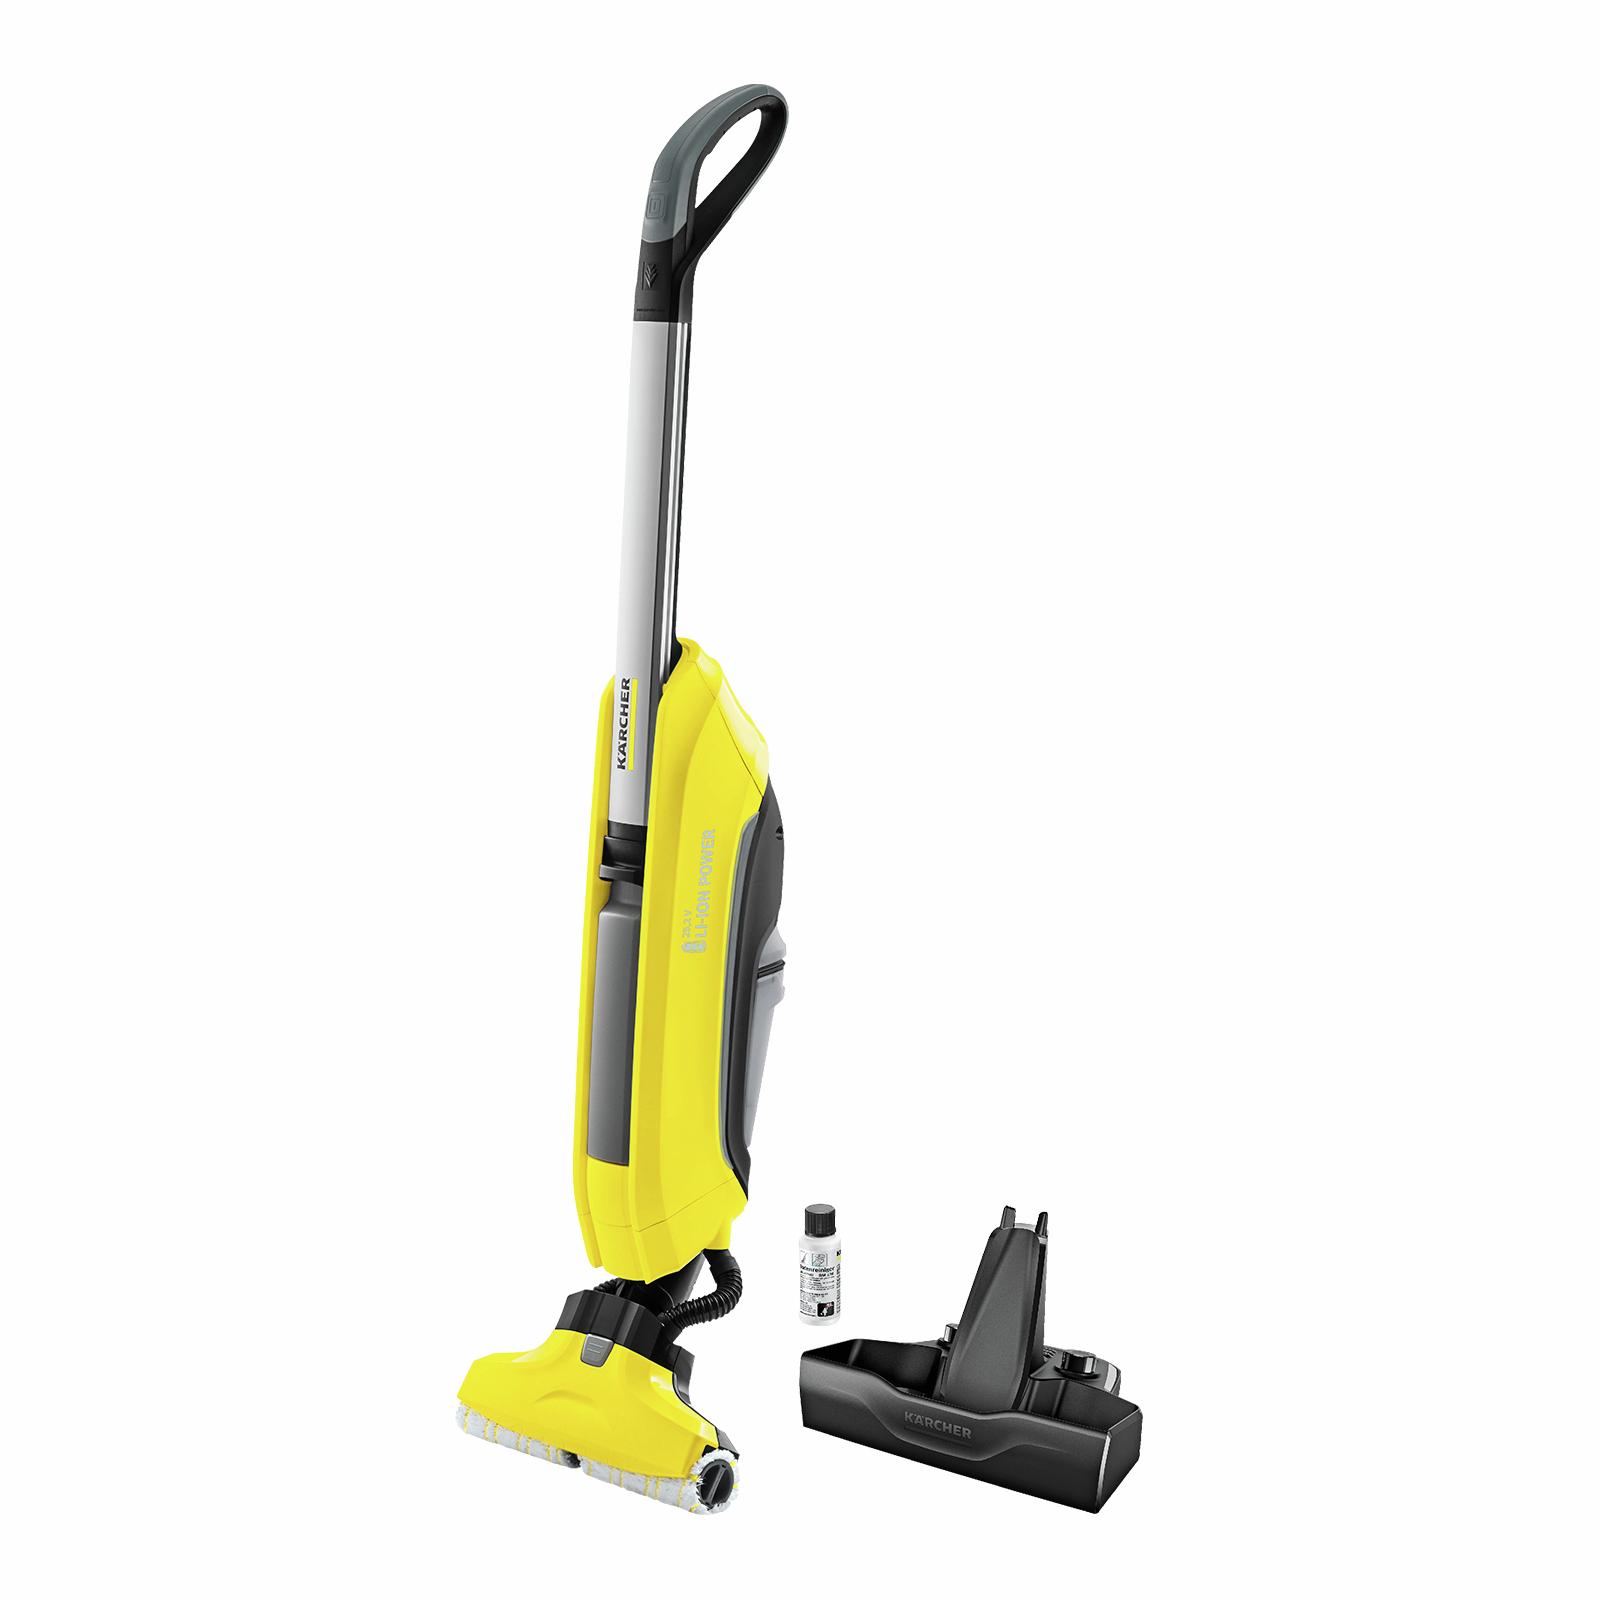 Karcher FC 5 Cordless Floor Cleaner